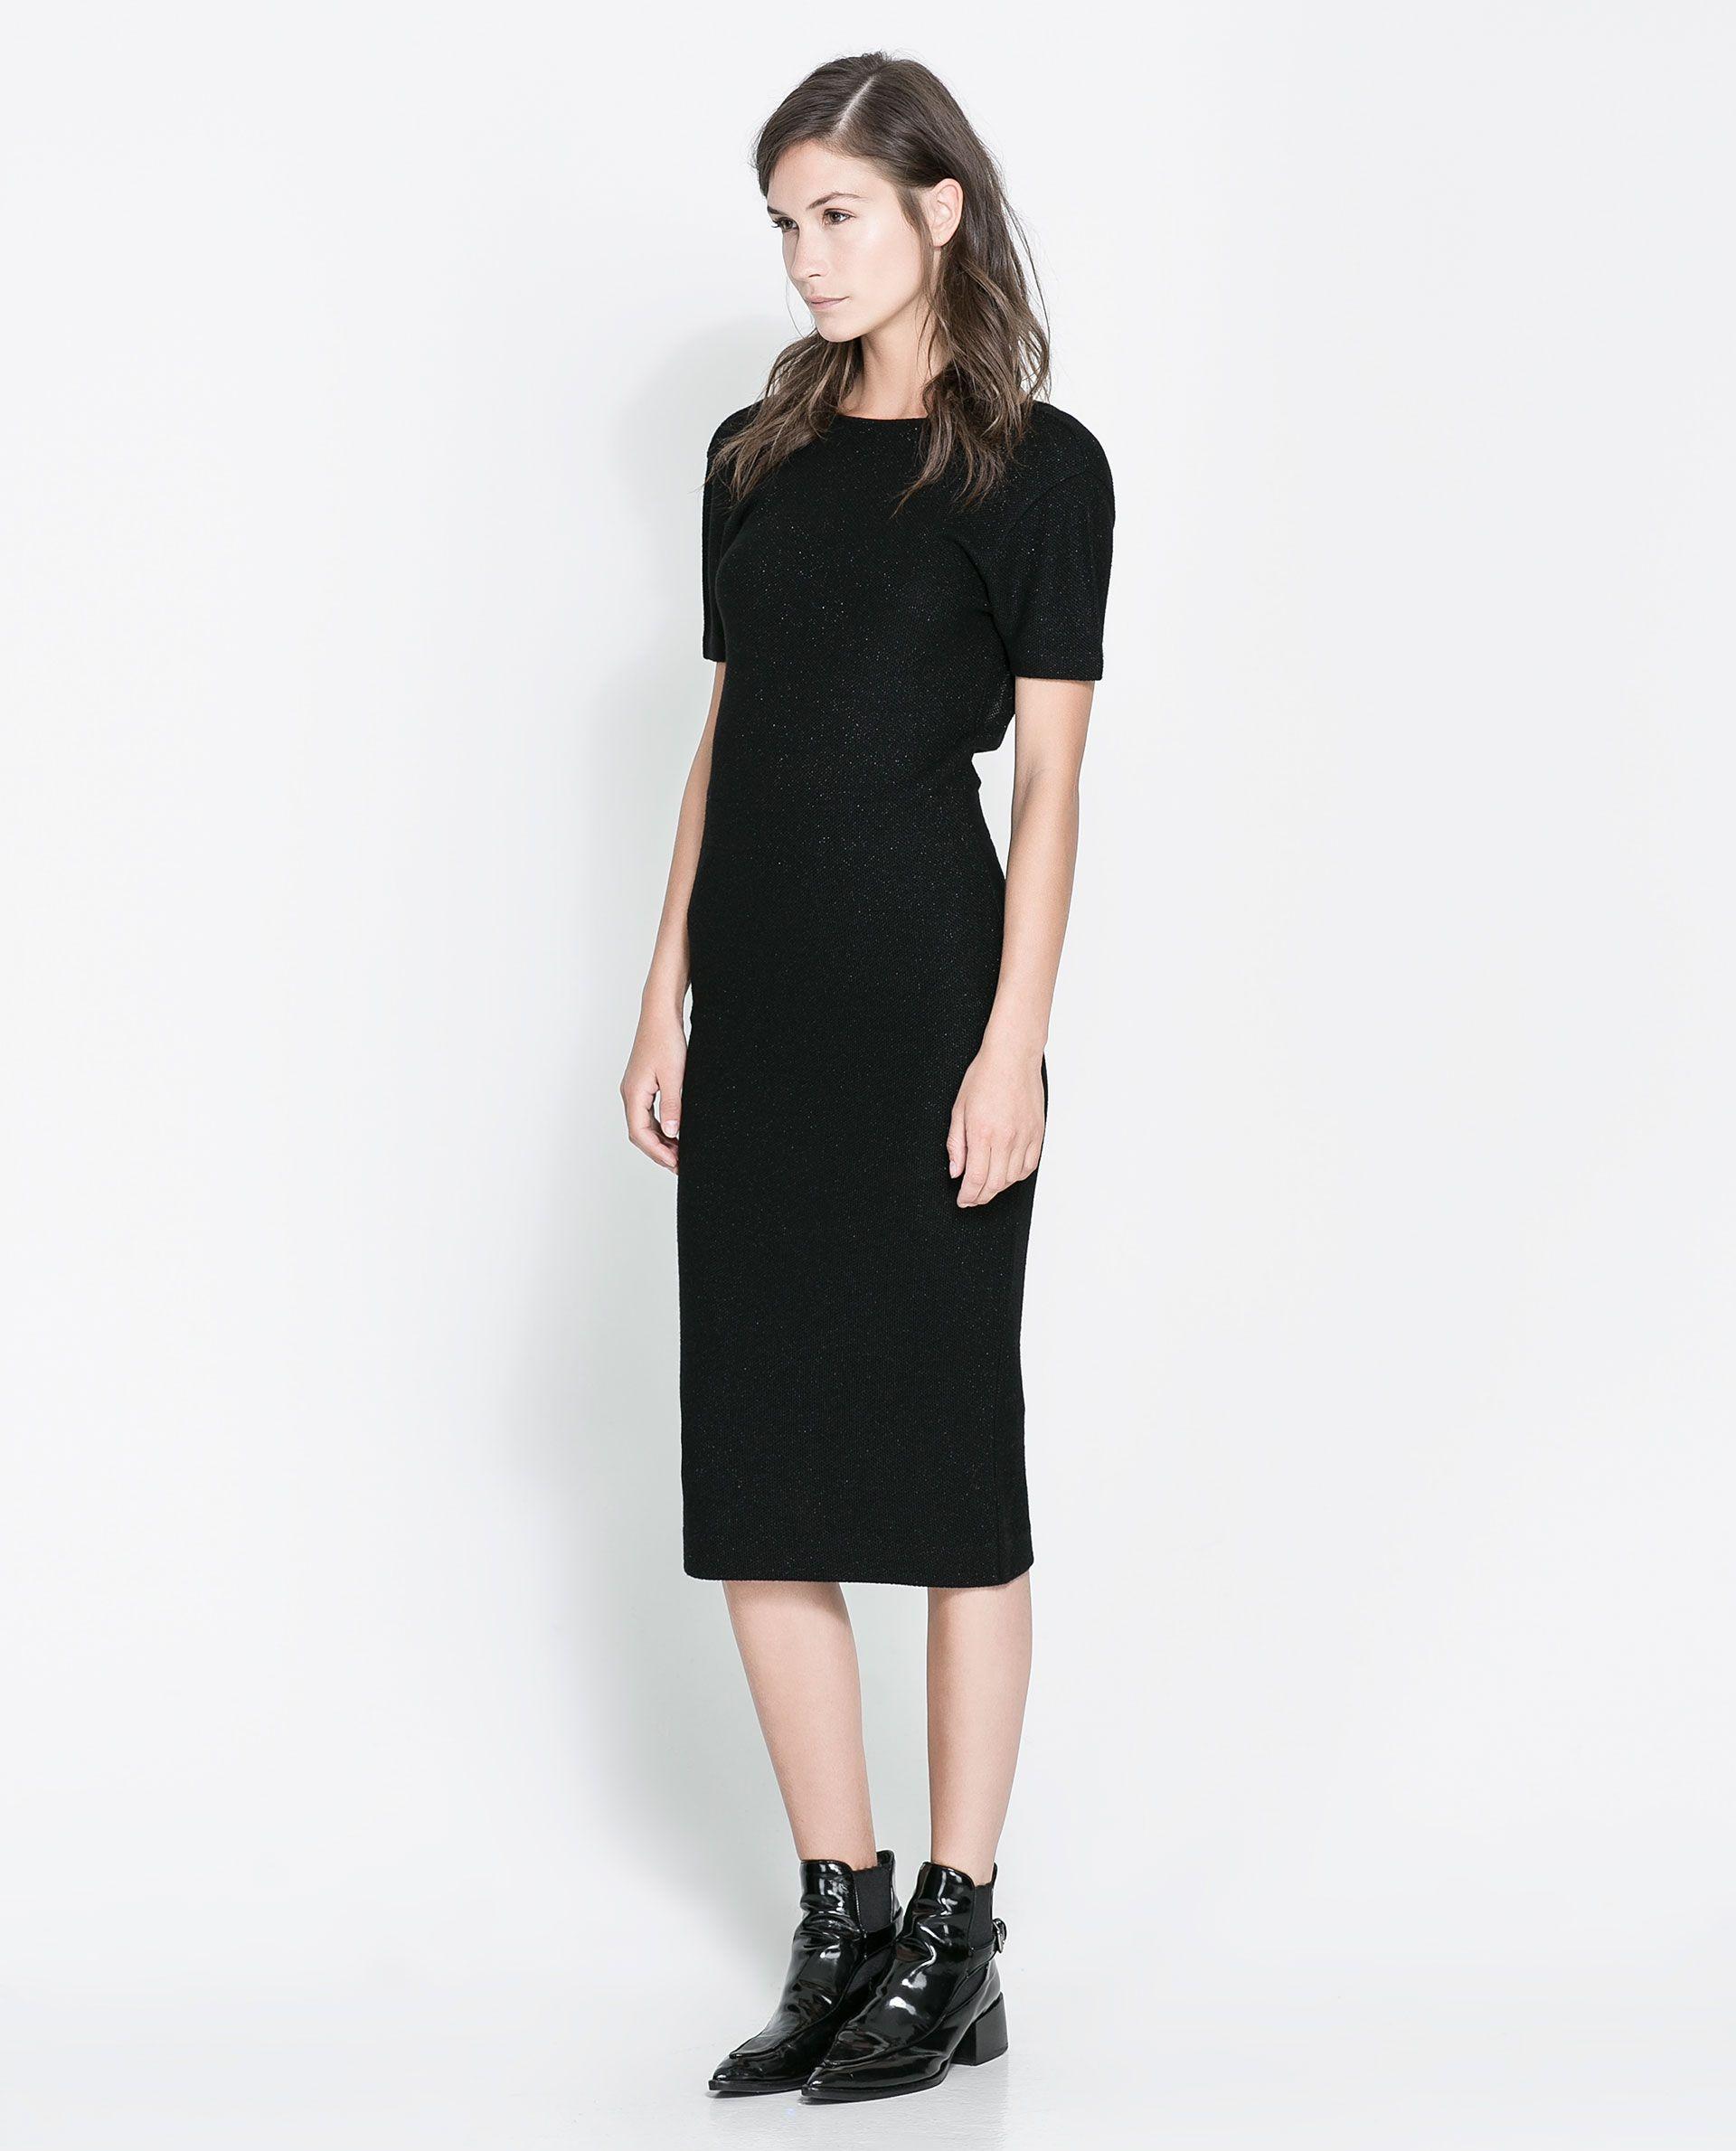 800k backless dress dresses woman zara indonesia shop 800k backless dress dresses woman zara indonesia stopboris Images